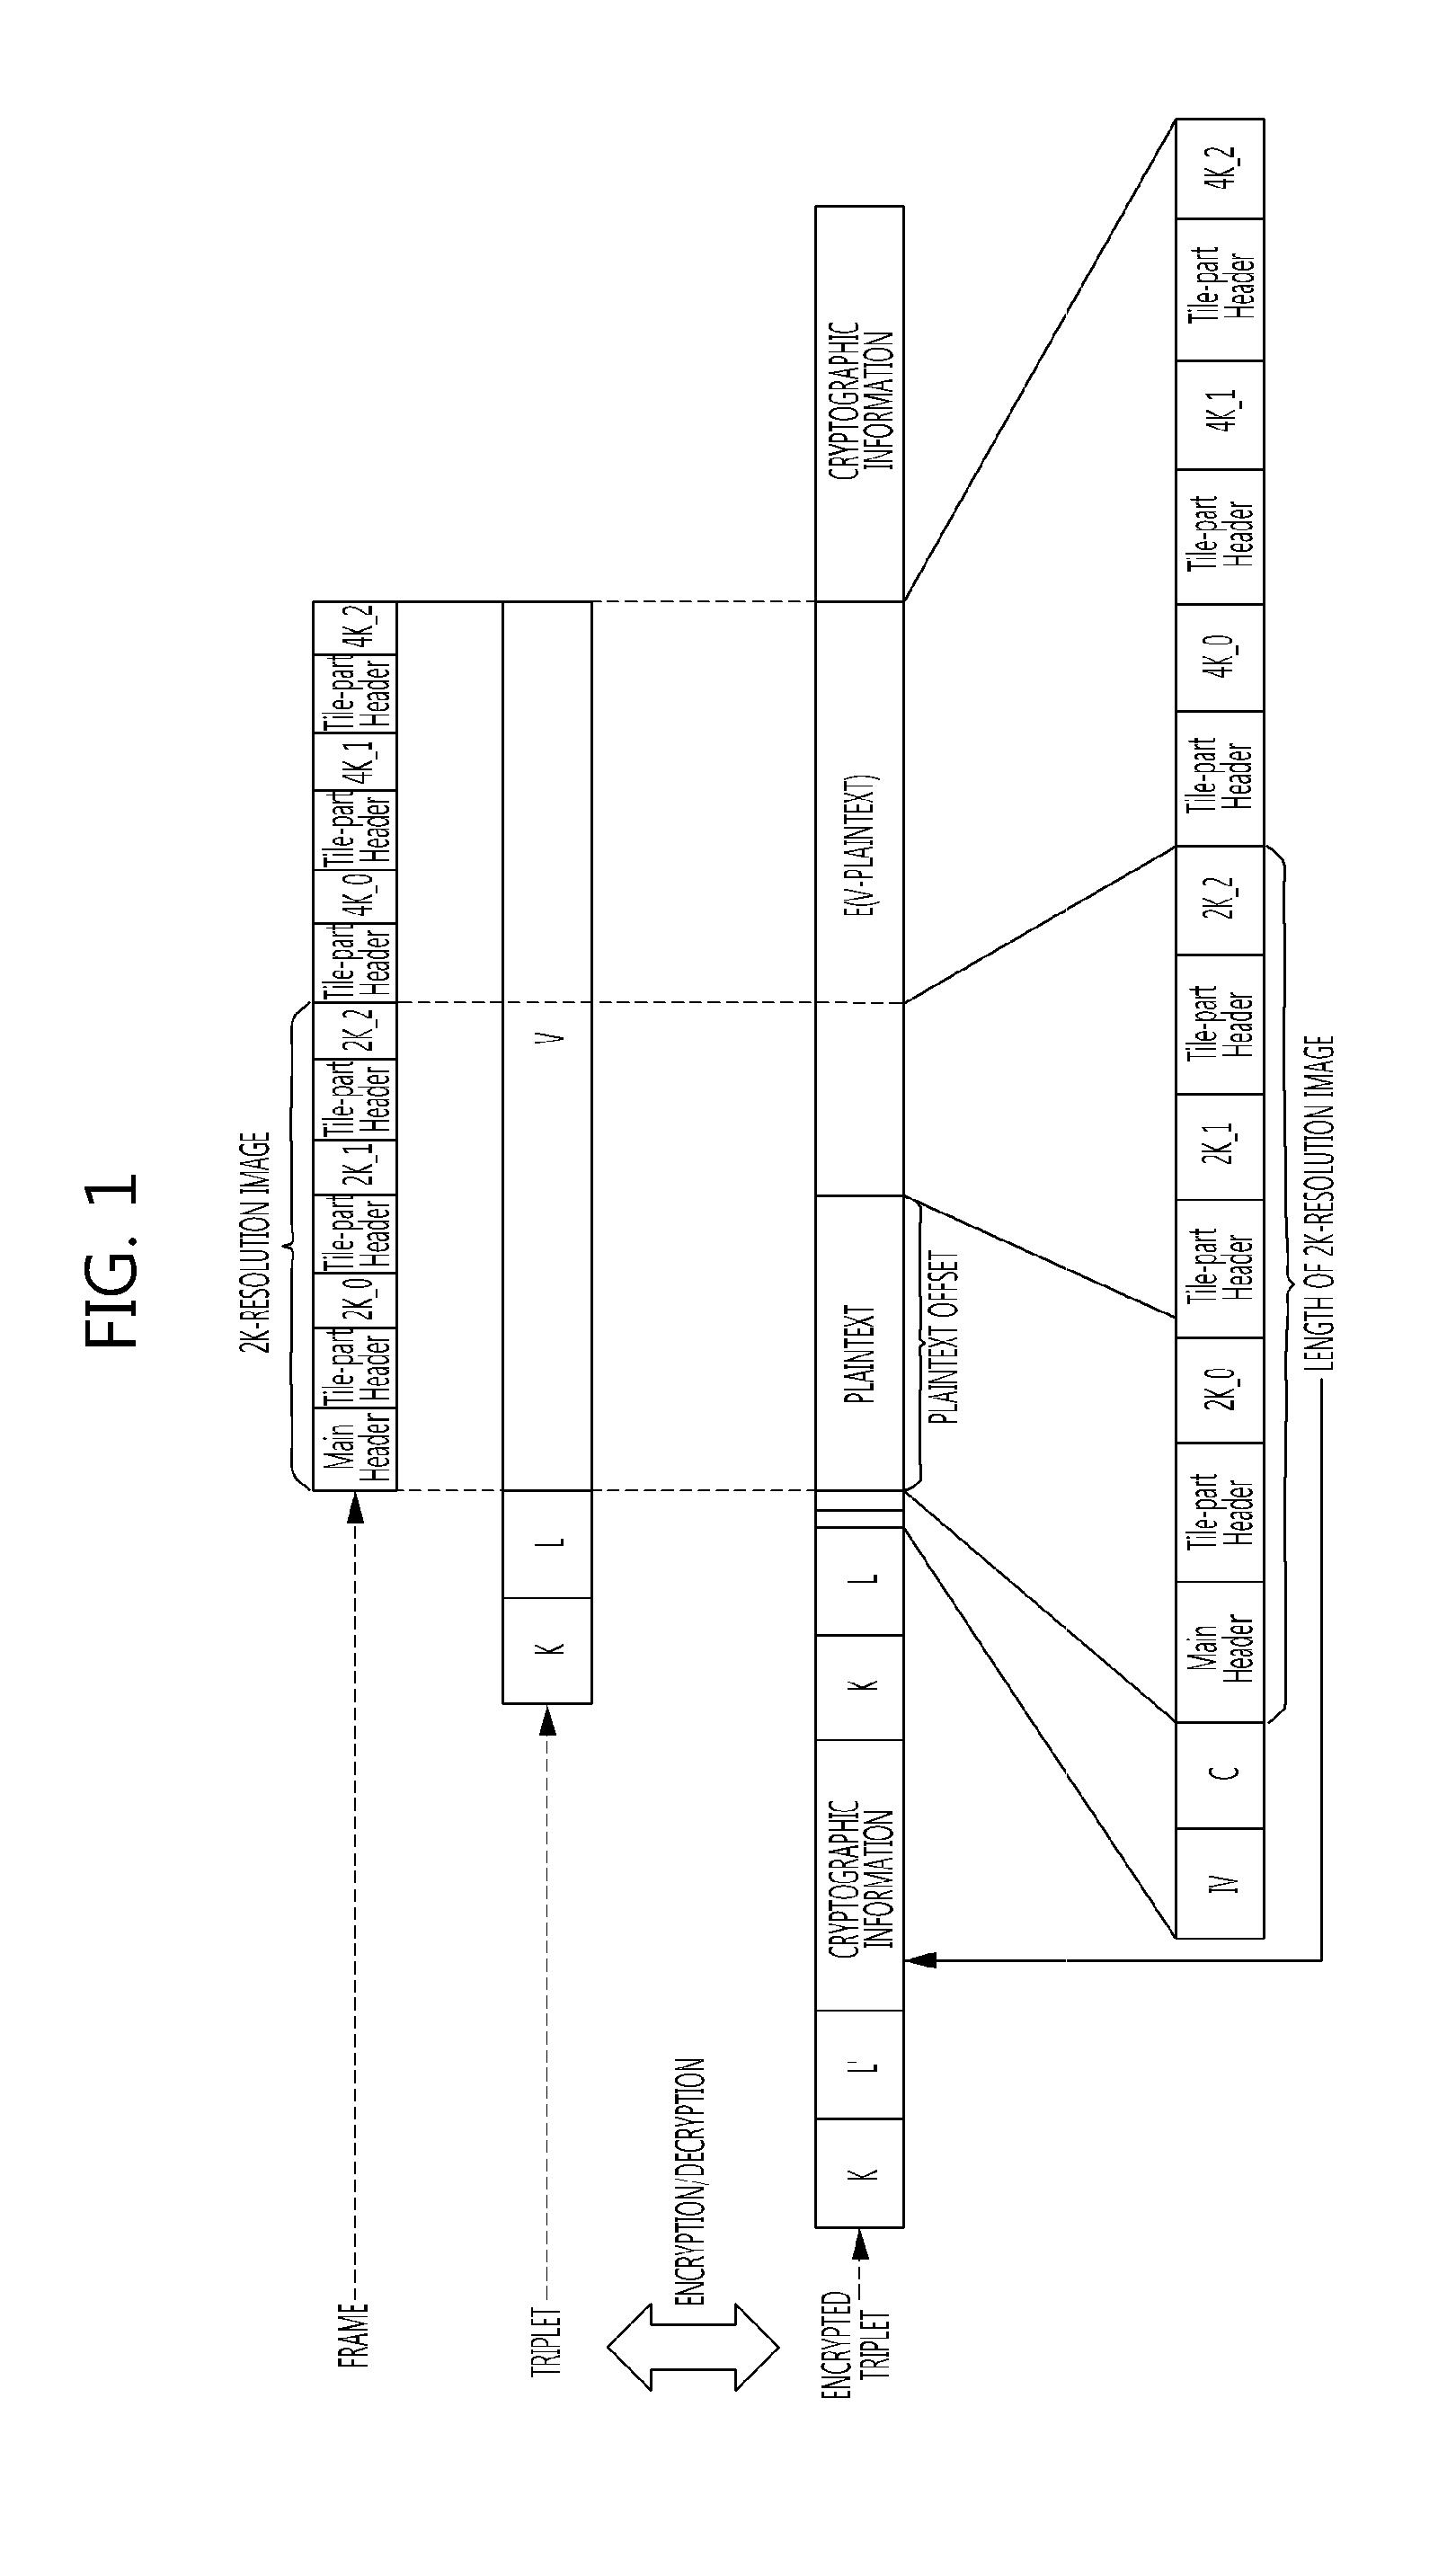 Patent US20120121236 - Apparatus and method for generating digital